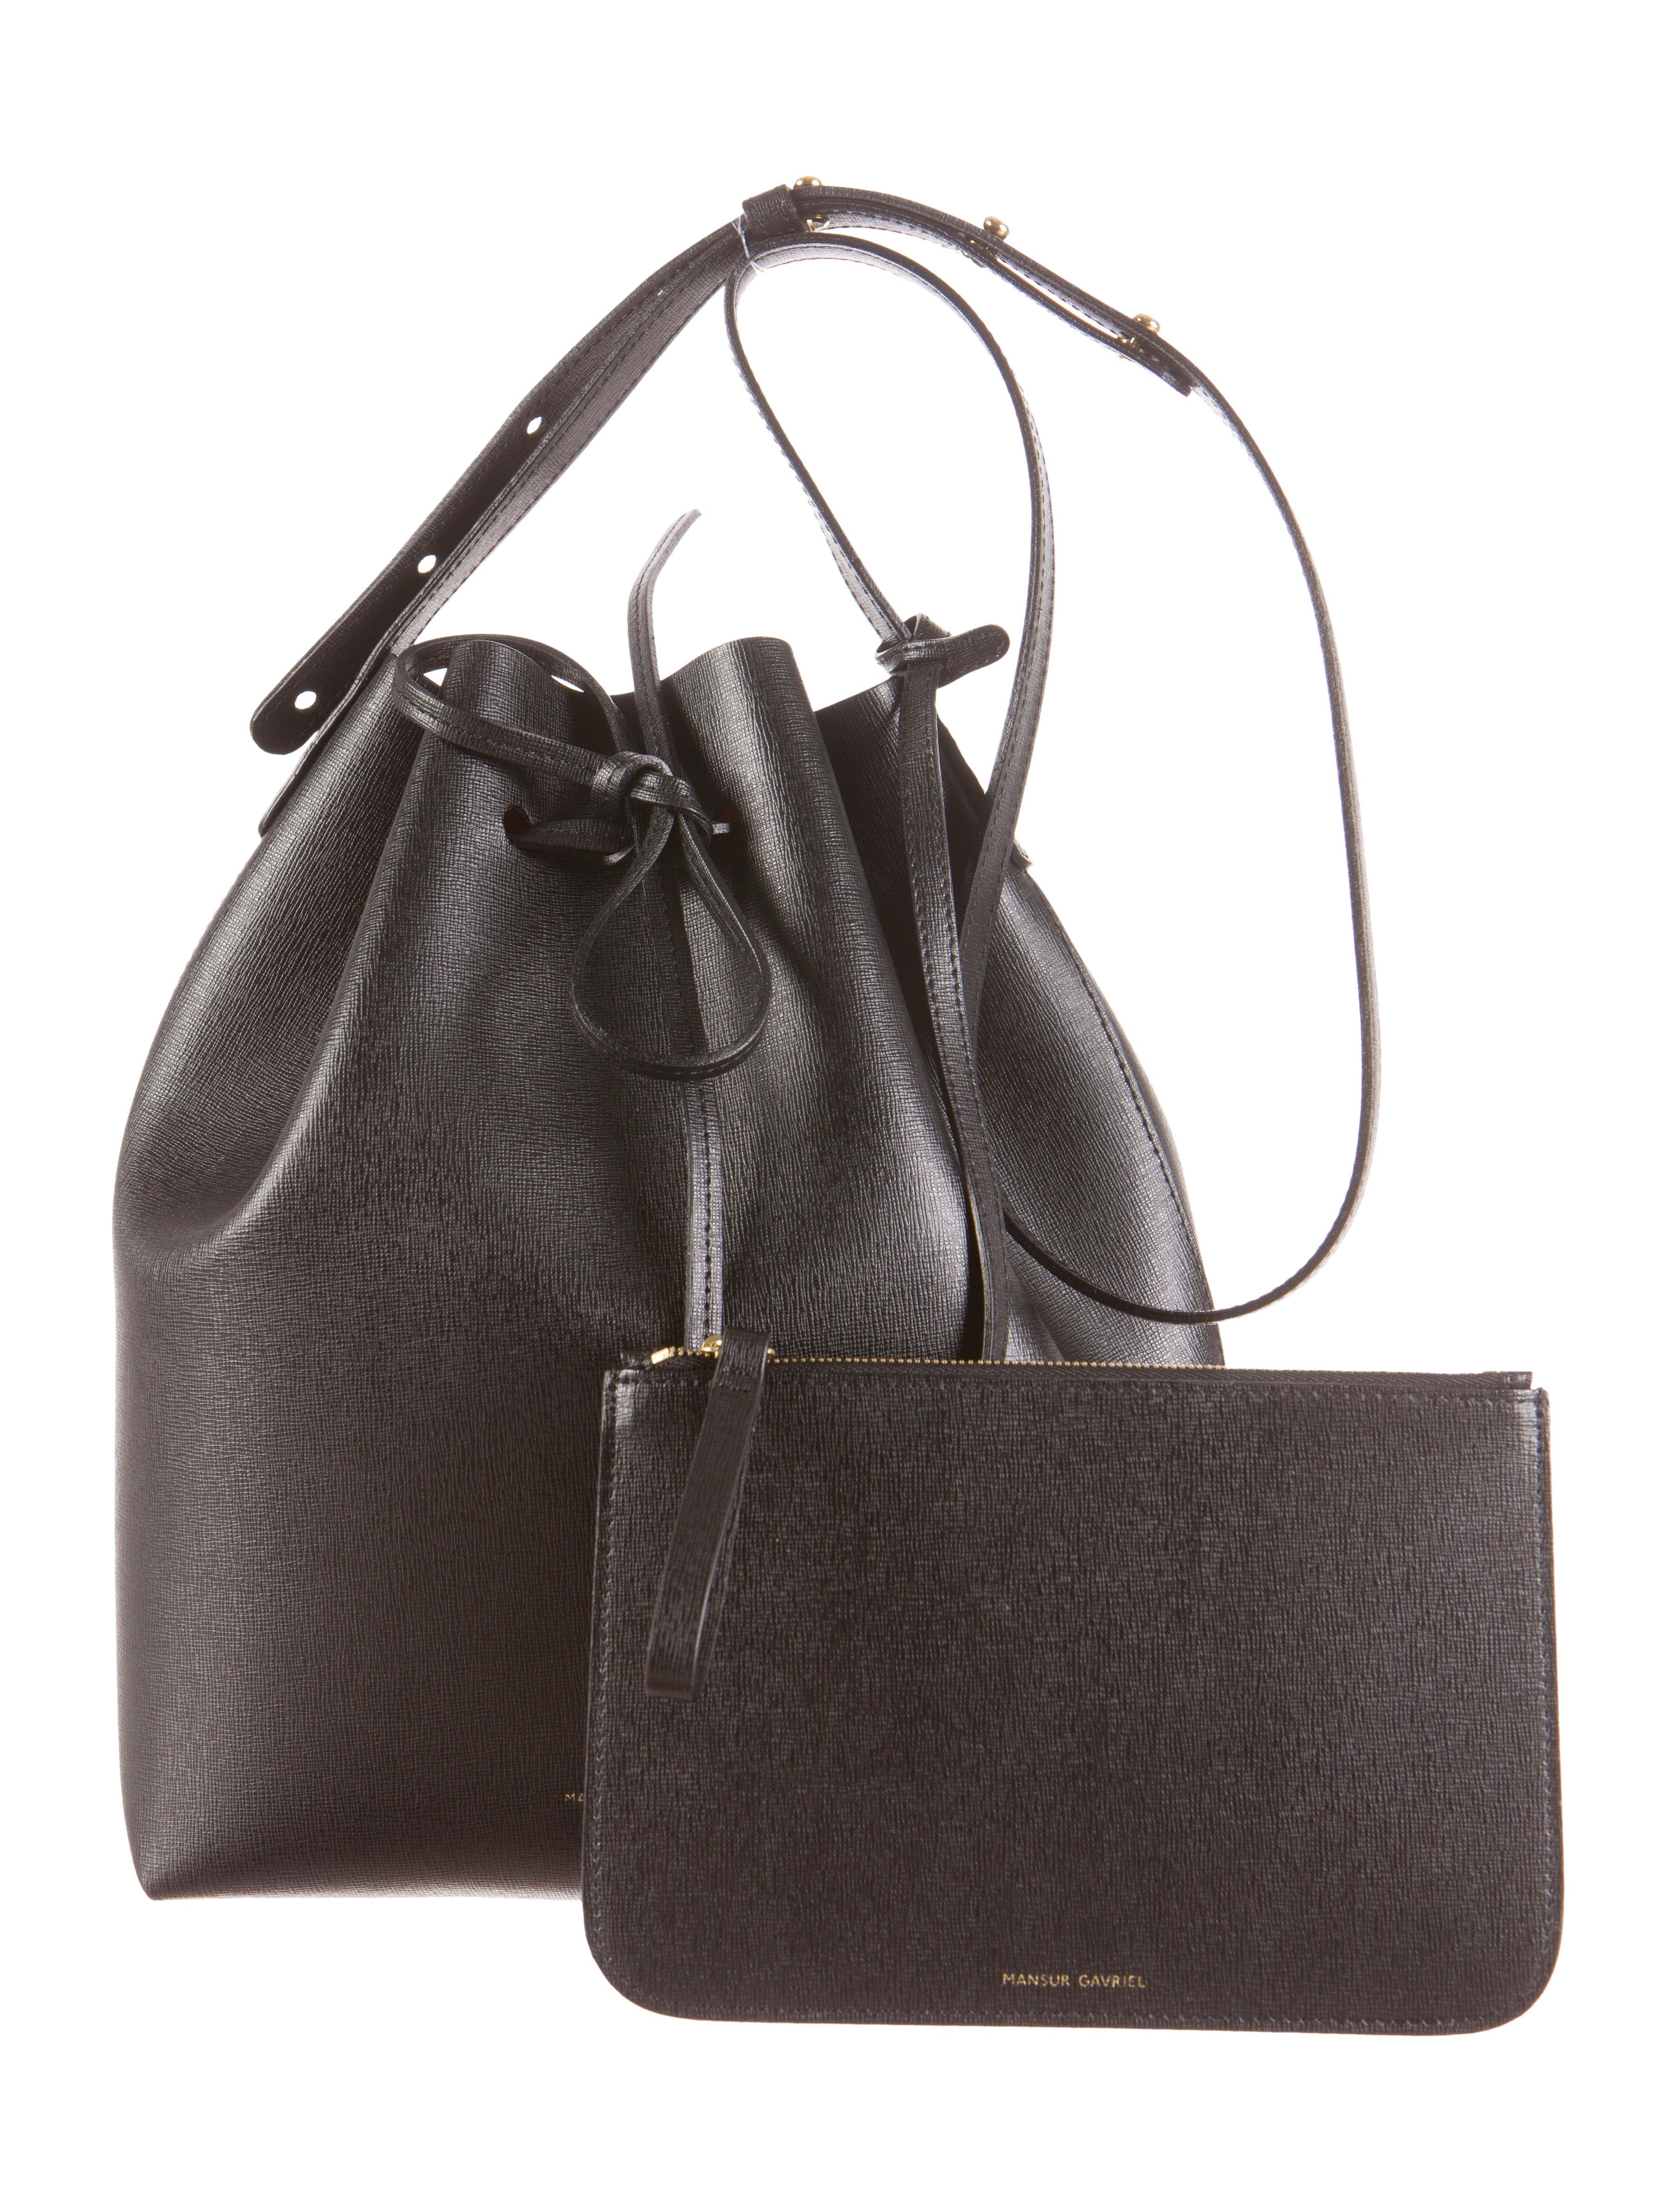 mansur gavriel bucket bag handbags wgy20168 the realreal. Black Bedroom Furniture Sets. Home Design Ideas